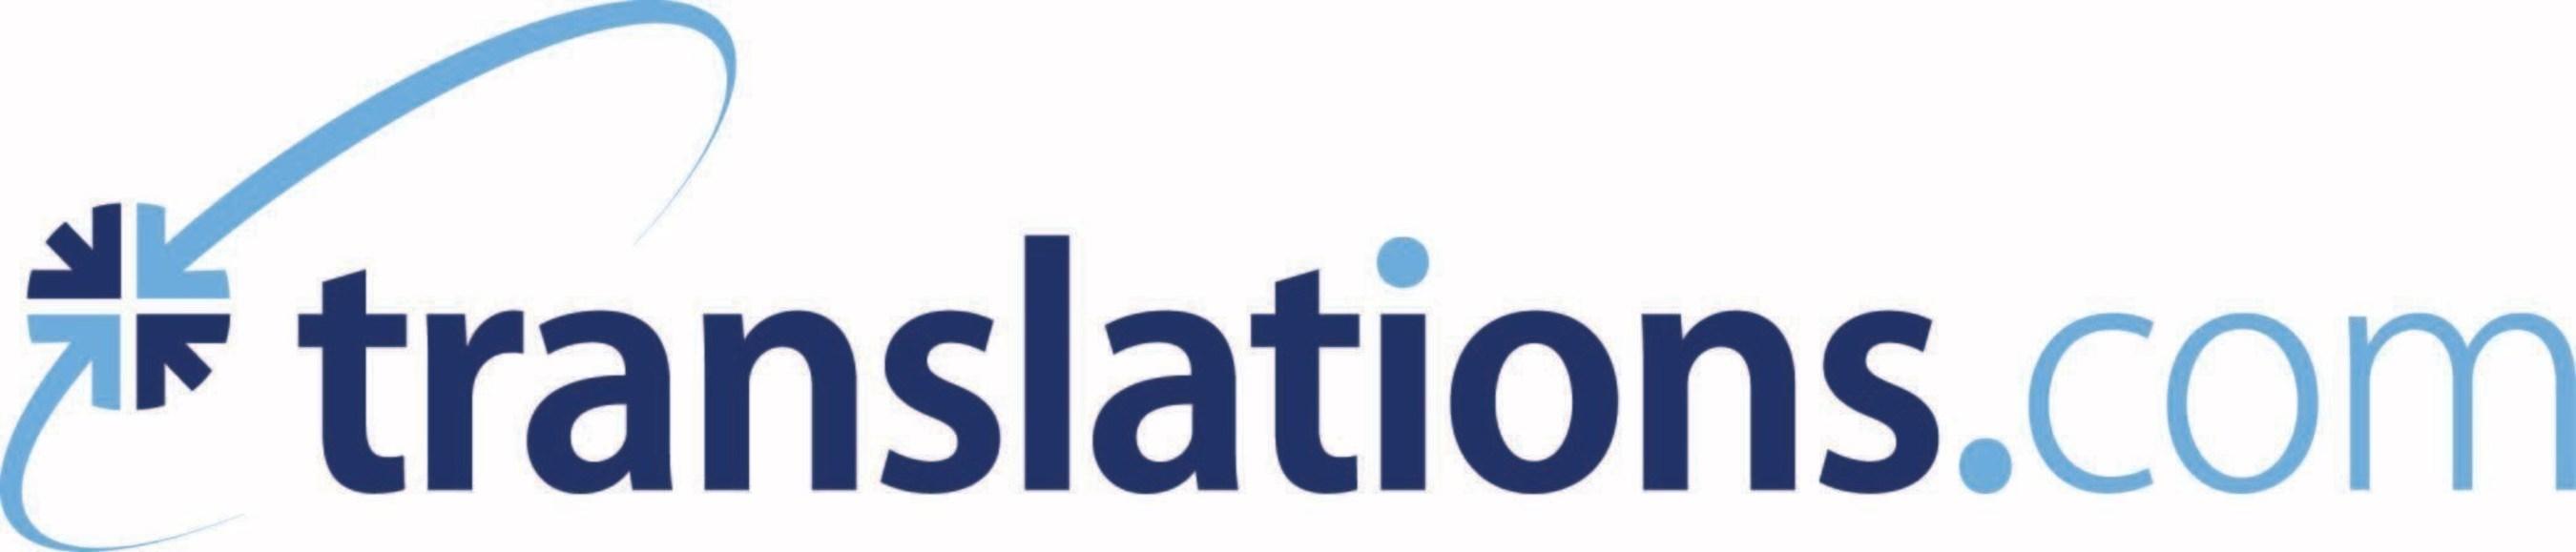 Translations.com Nominated for hybris Global ISV Partner of the Year